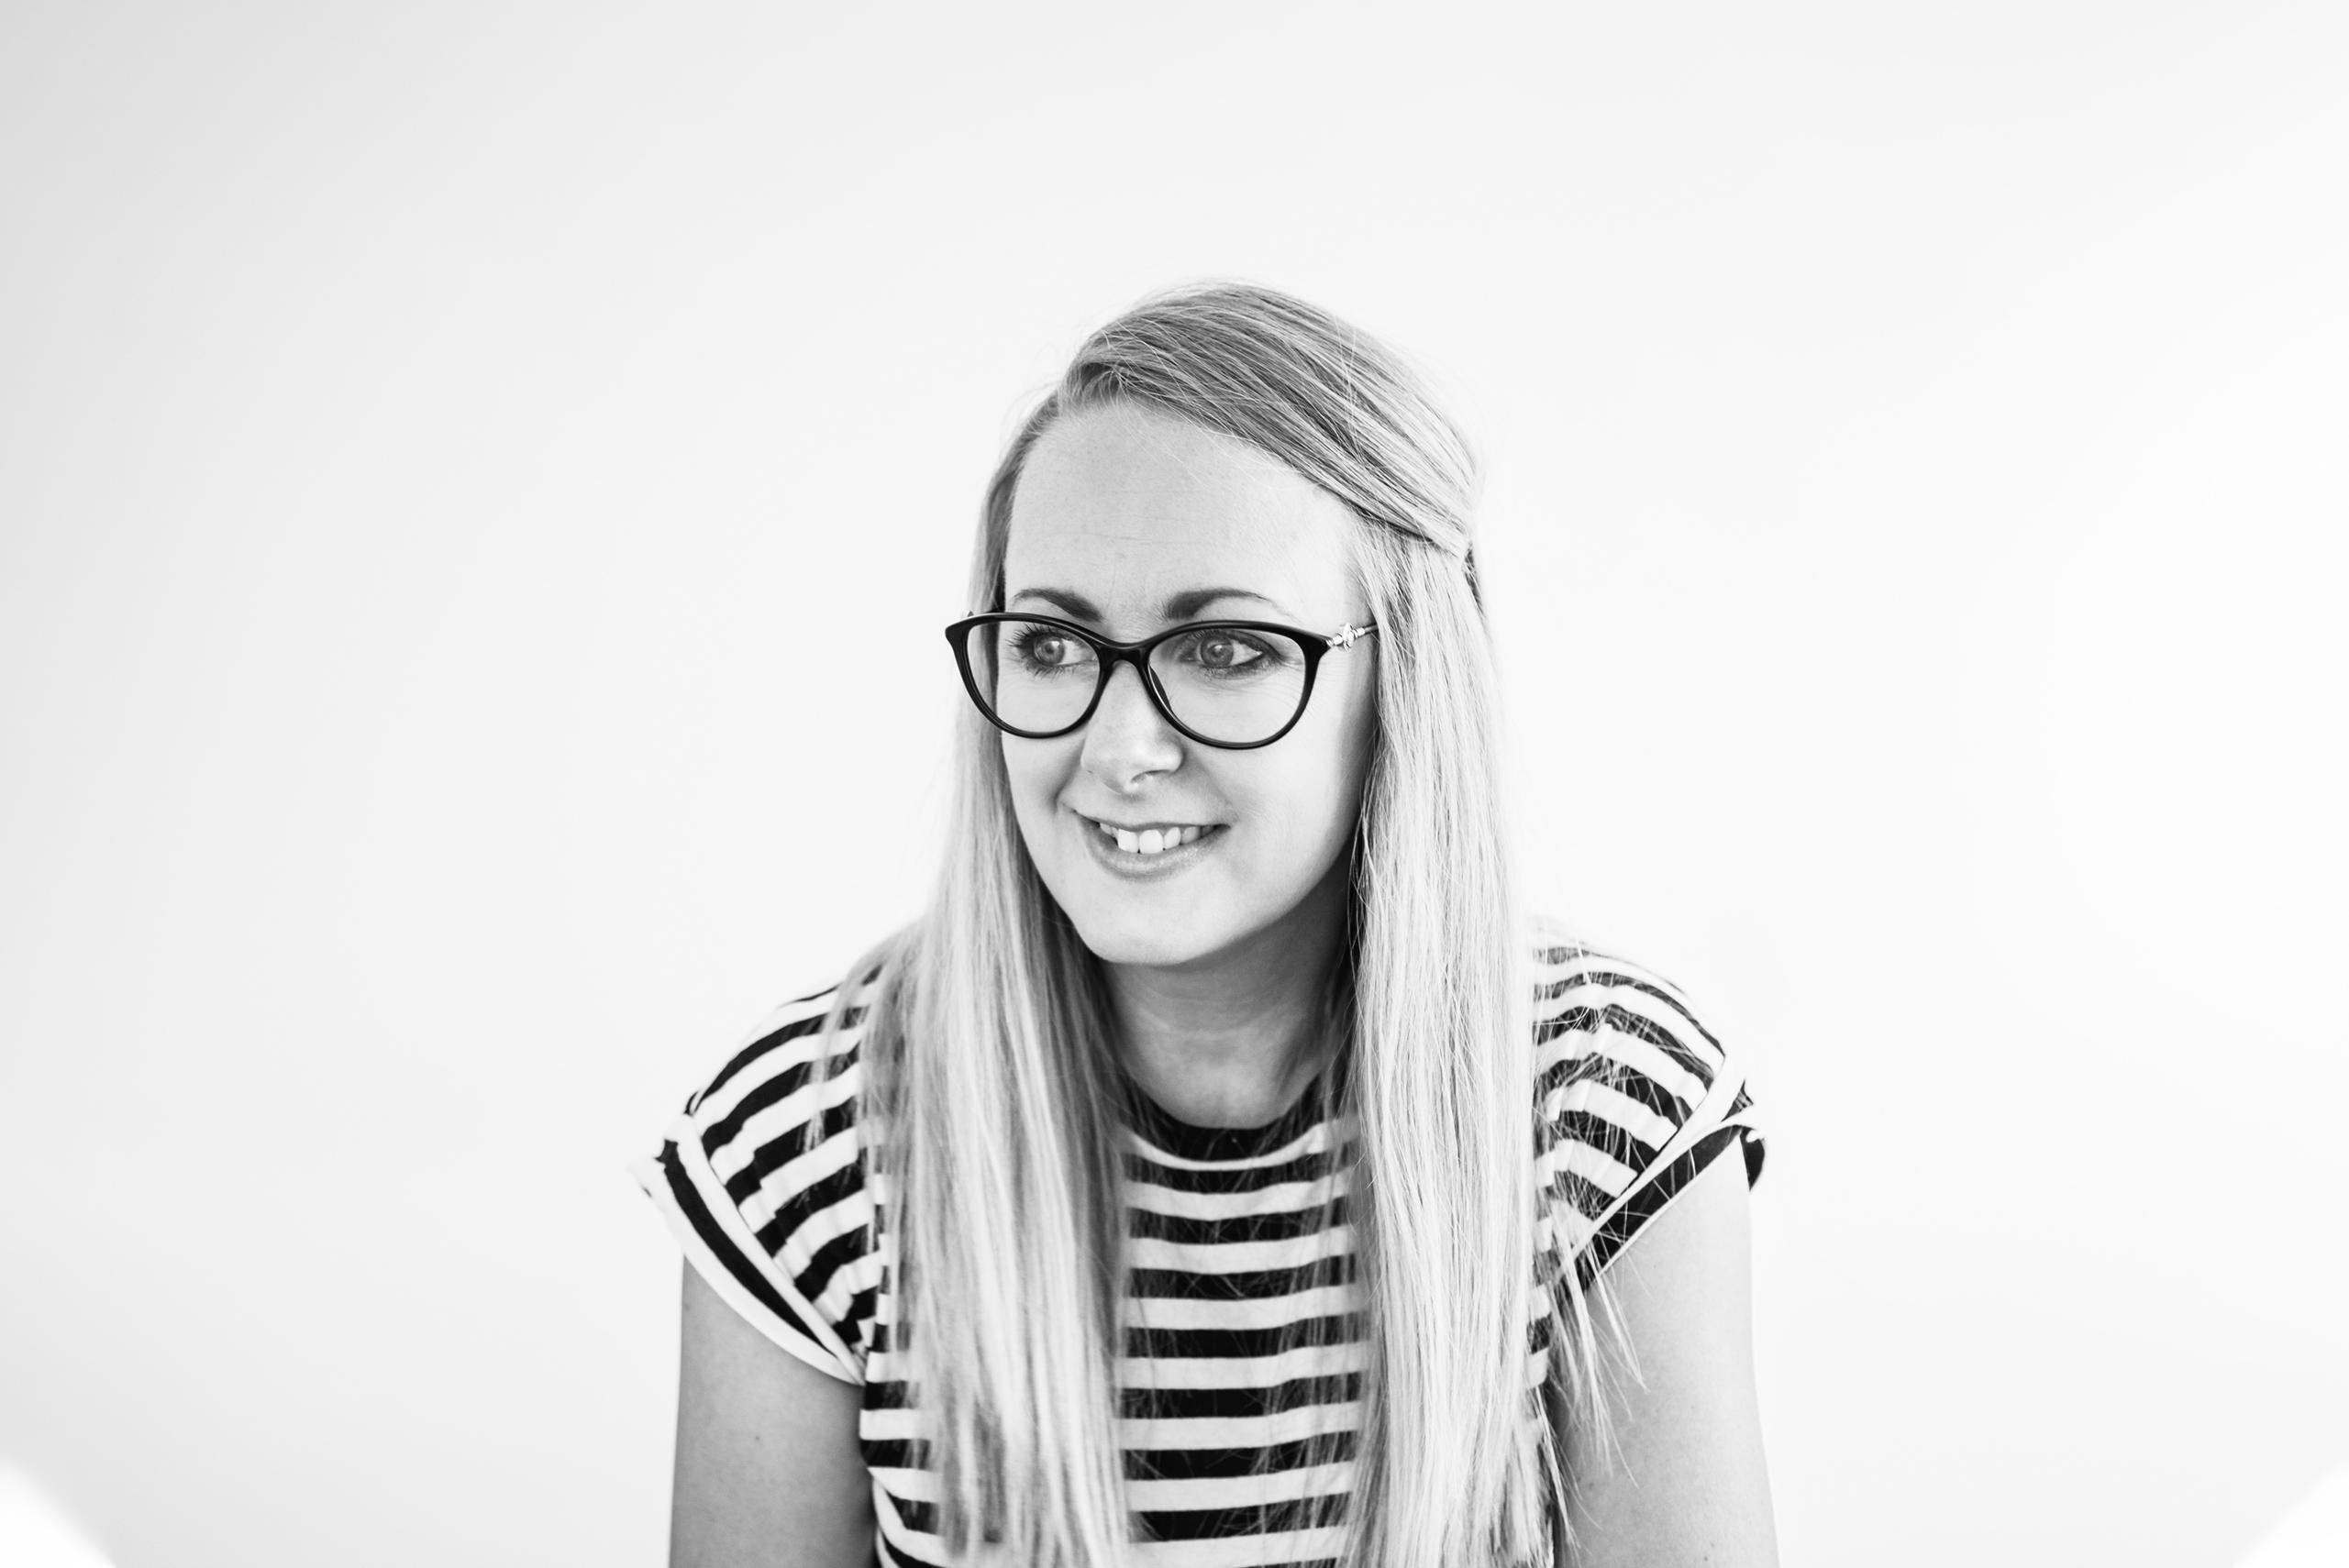 Blonde girl in glasses smiling graphic designer owner of whitespace studio